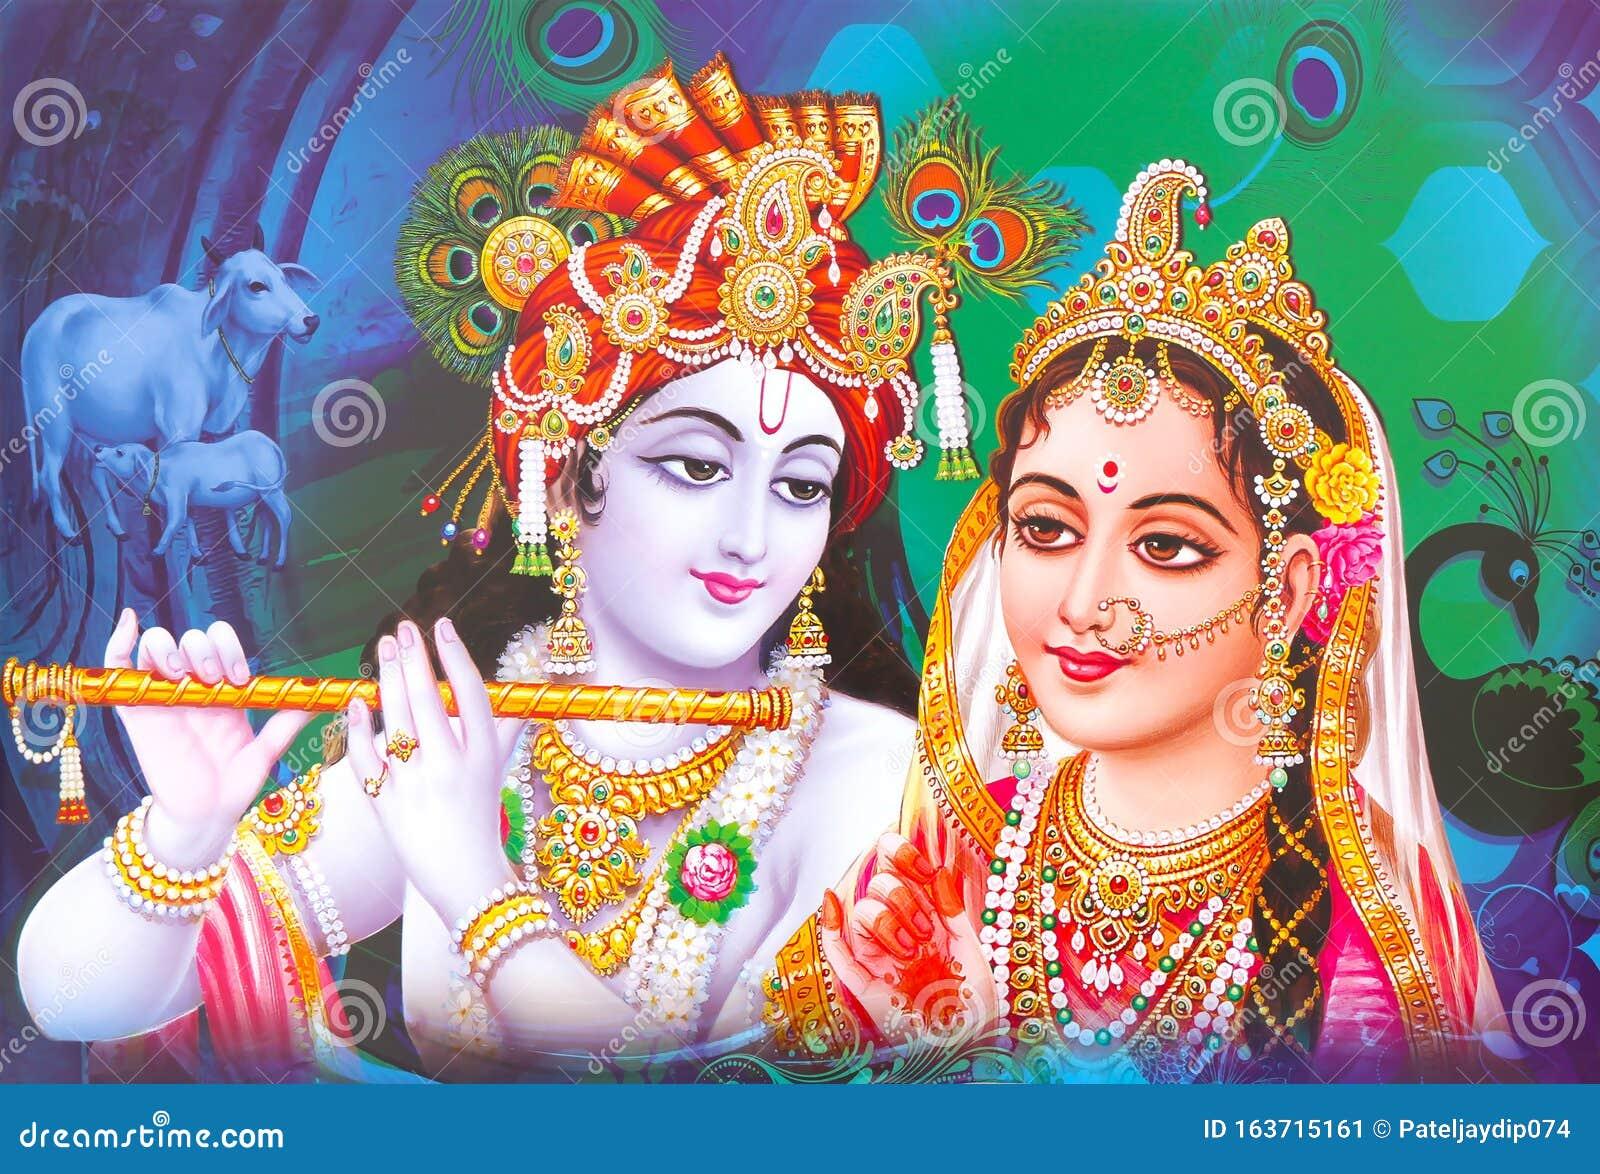 1 806 radha krishna photos free royalty free stock photos from dreamstime https www dreamstime com hindu god radha krishna wallpaper colorful background lord radha krishna beautiful wallpaper image163715161